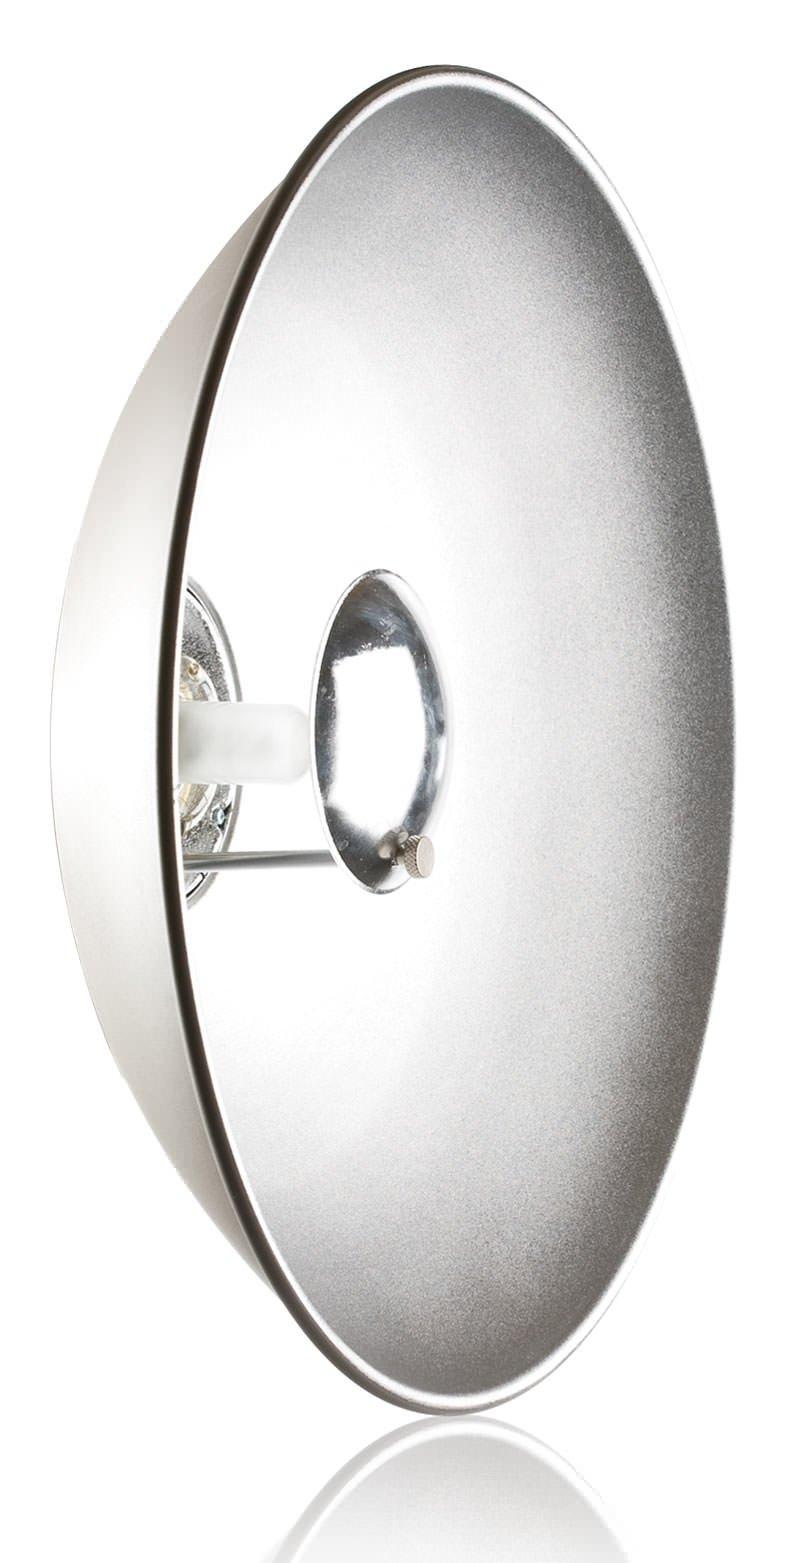 ELINCHROM softlite stříbrný 55° 44cm (beauty-dish)